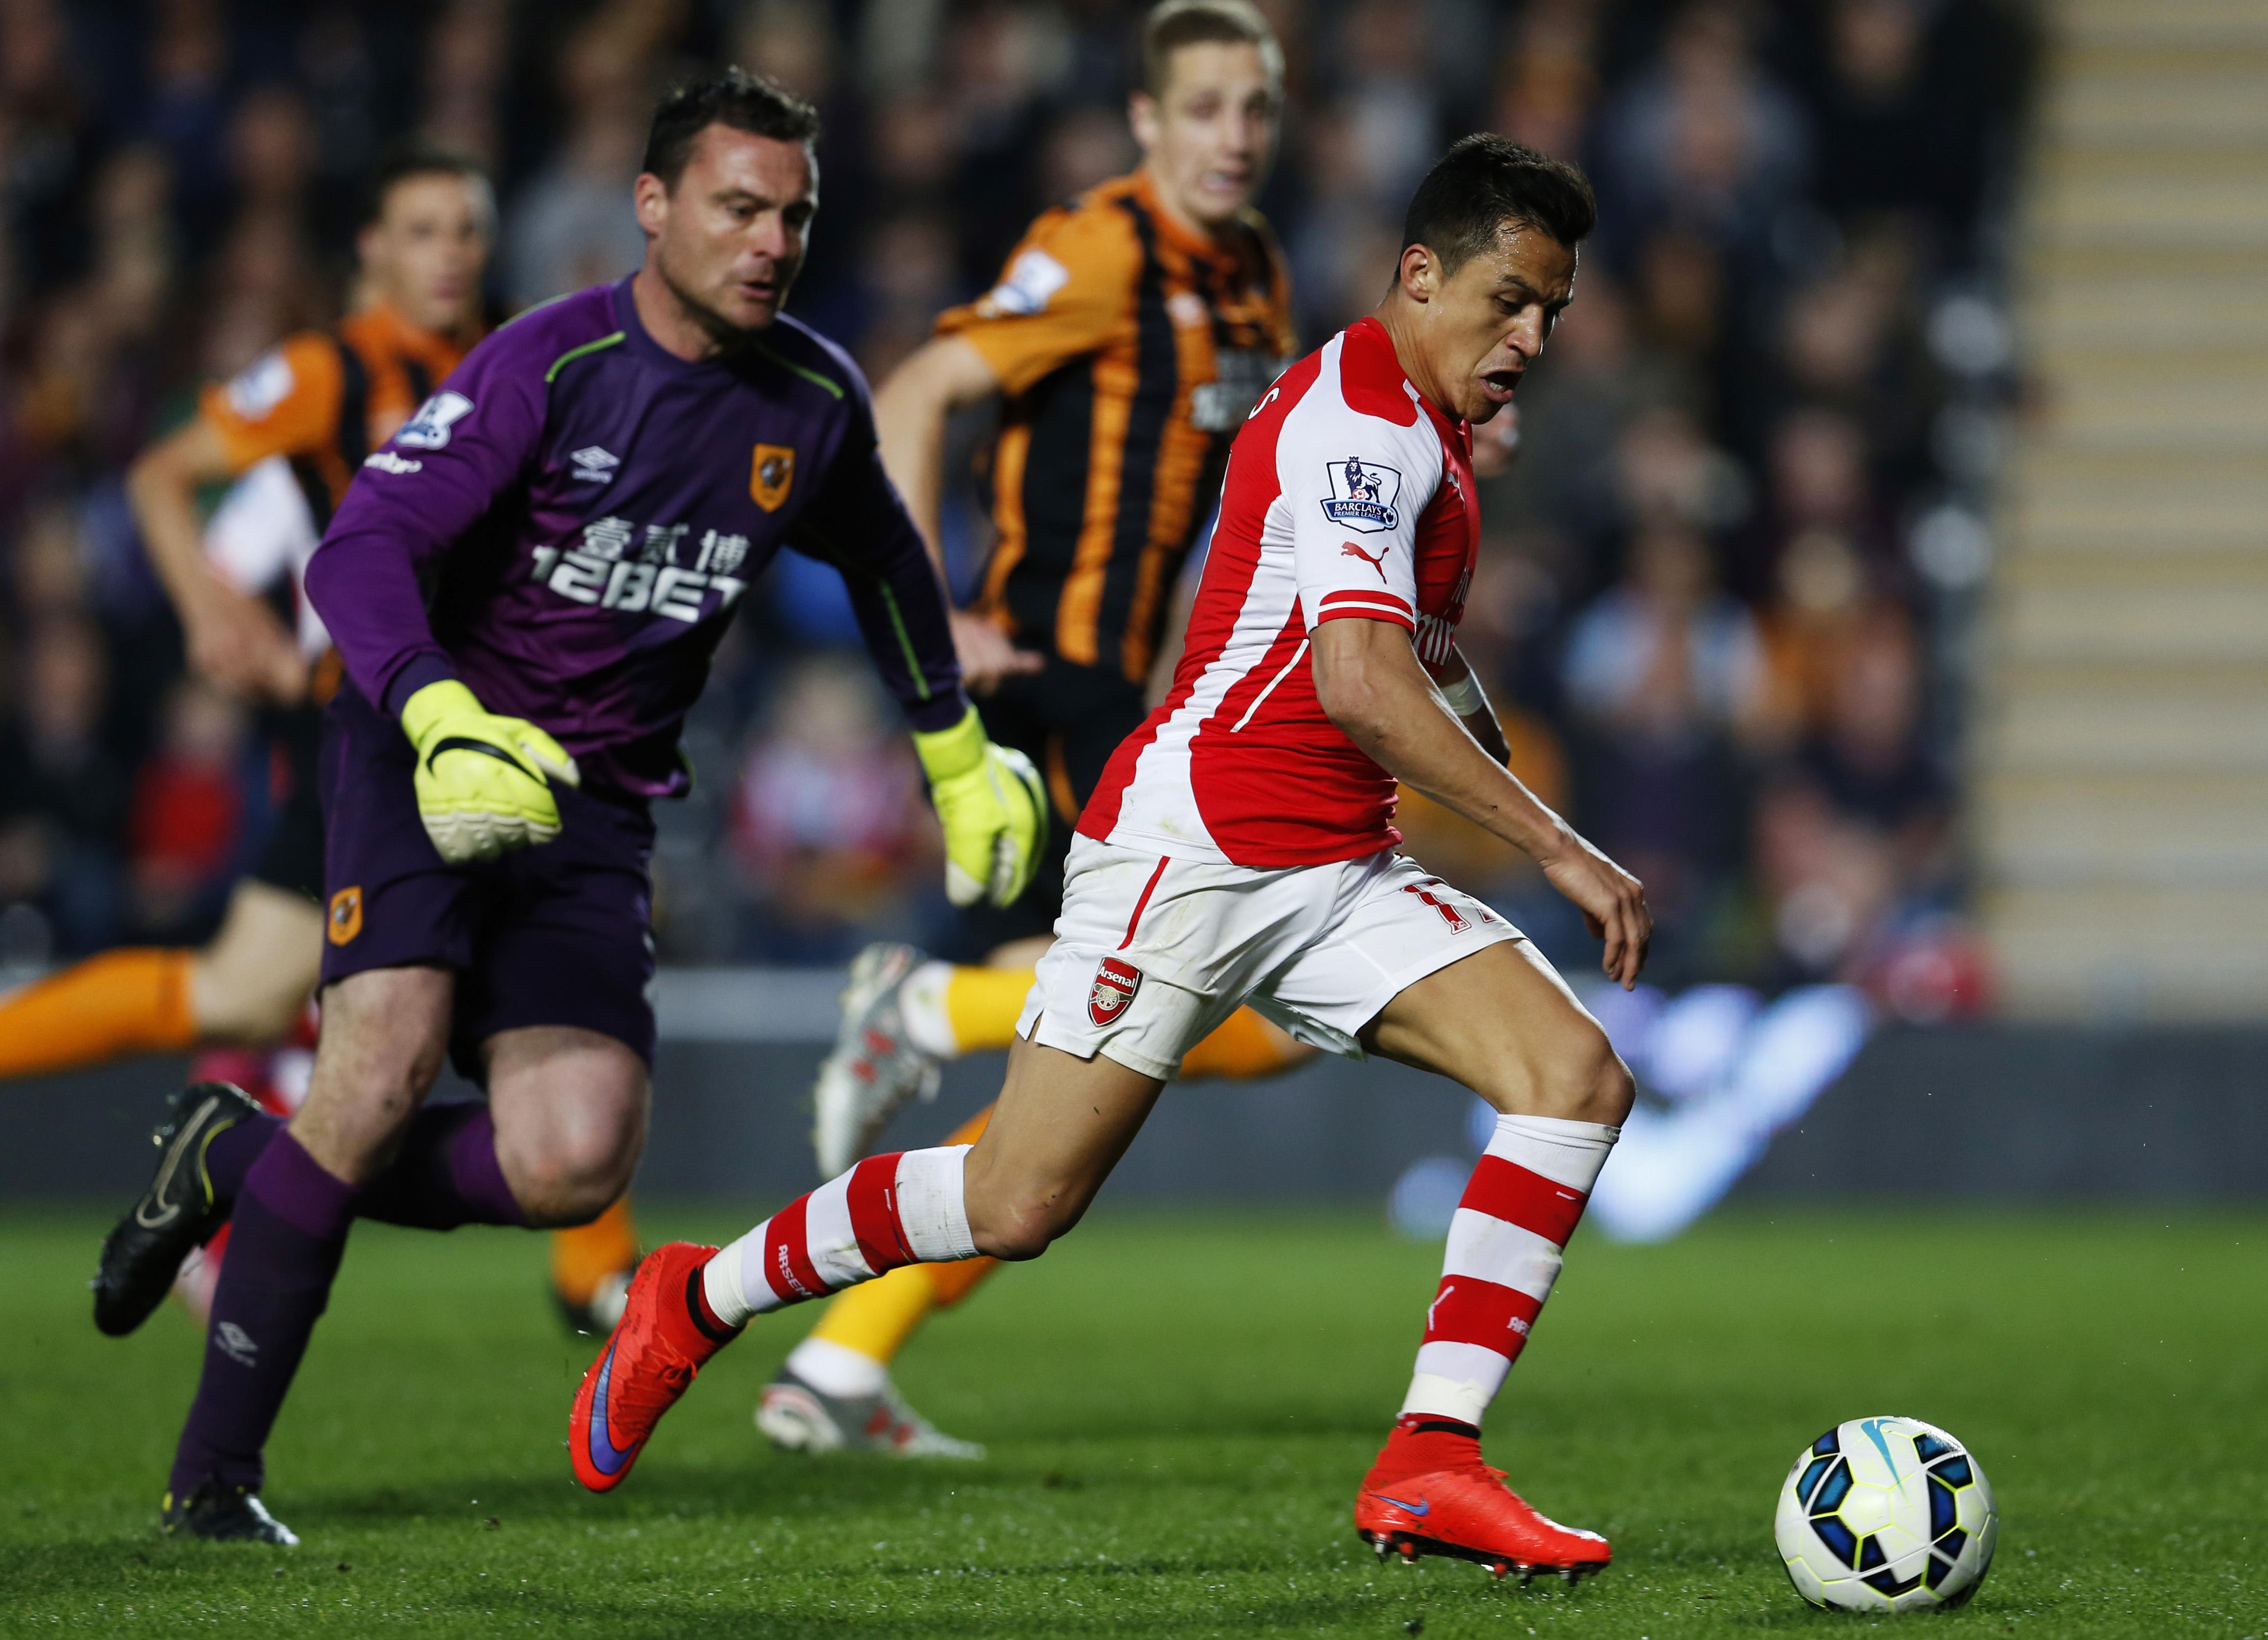 Aliko Dangote Africa S Richest Man Wants To Buy Arsenal Soccer Club Quartz